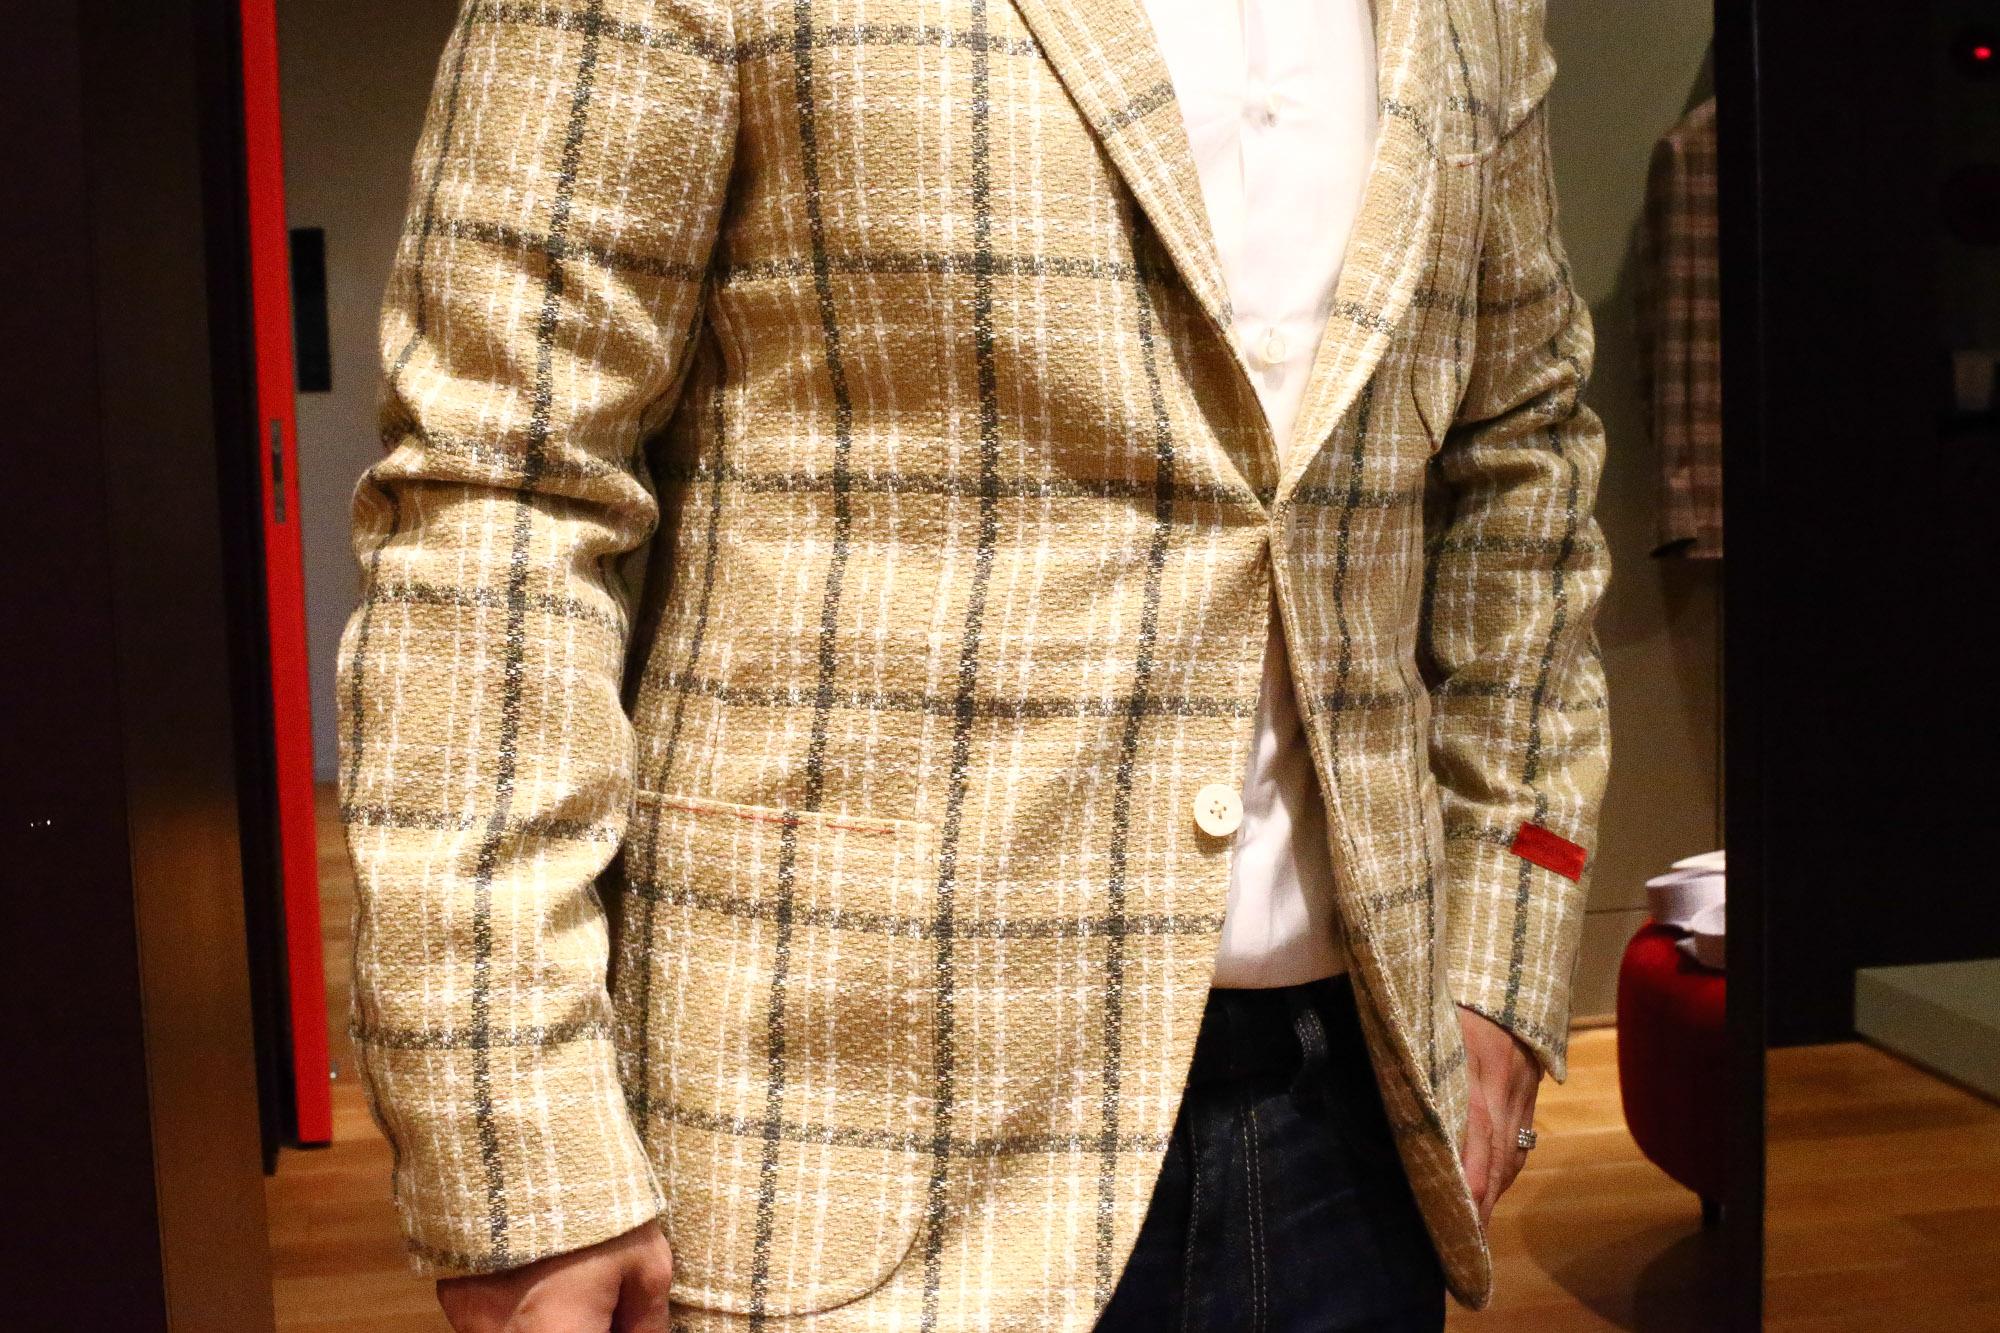 ISAIA イザイア 2017年 春夏 展示会 愛知 名古屋 Alto e Diritto アルト エ デリット 取扱い ジャケットスタイル提案